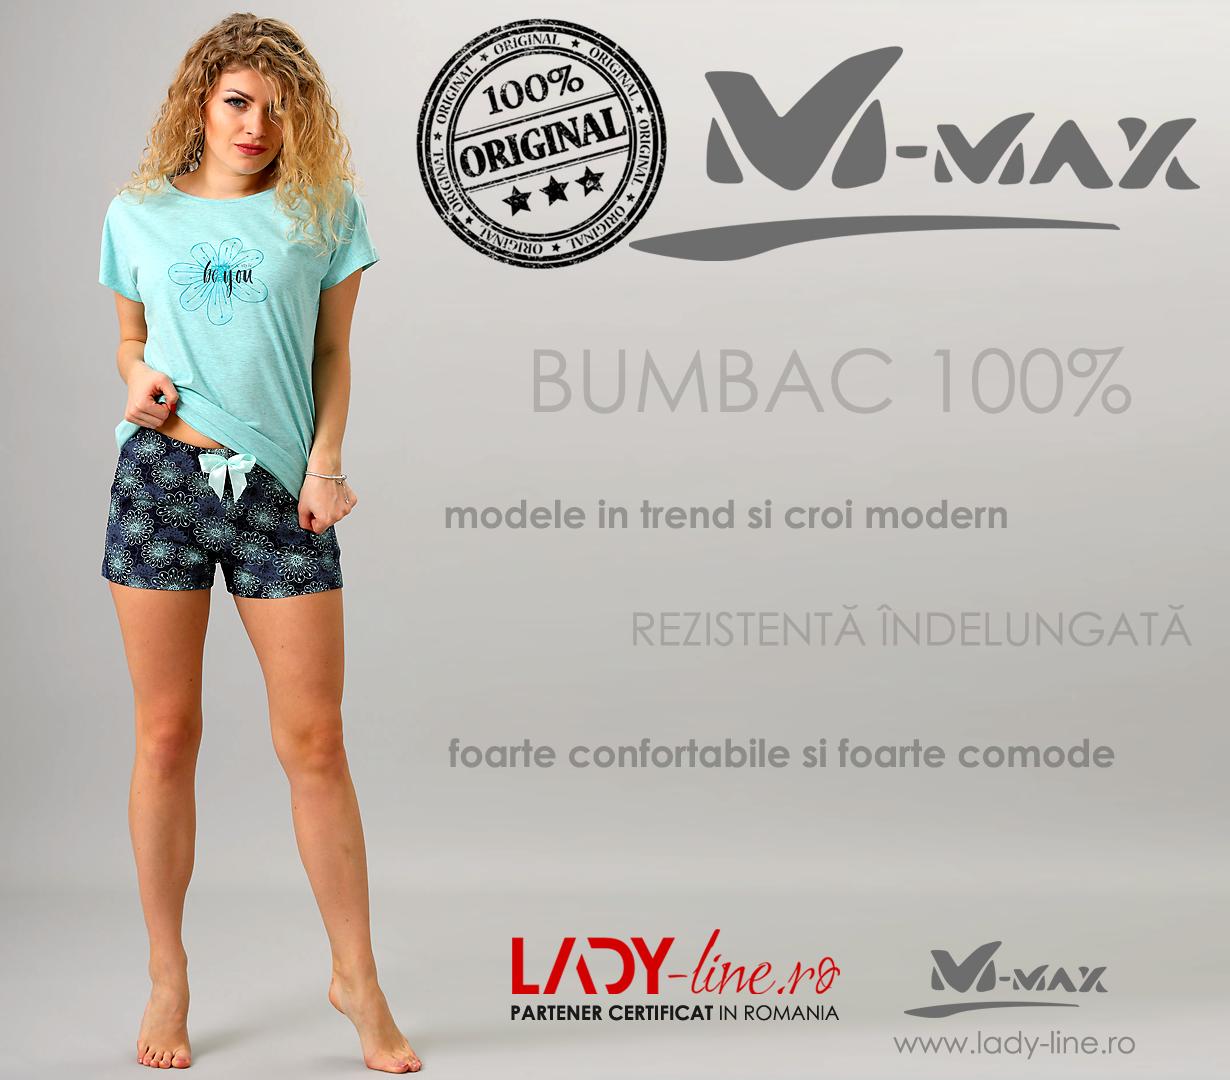 Pijamale Dama M-Max, Bumbac 100%, 'Be You - Design & Style'